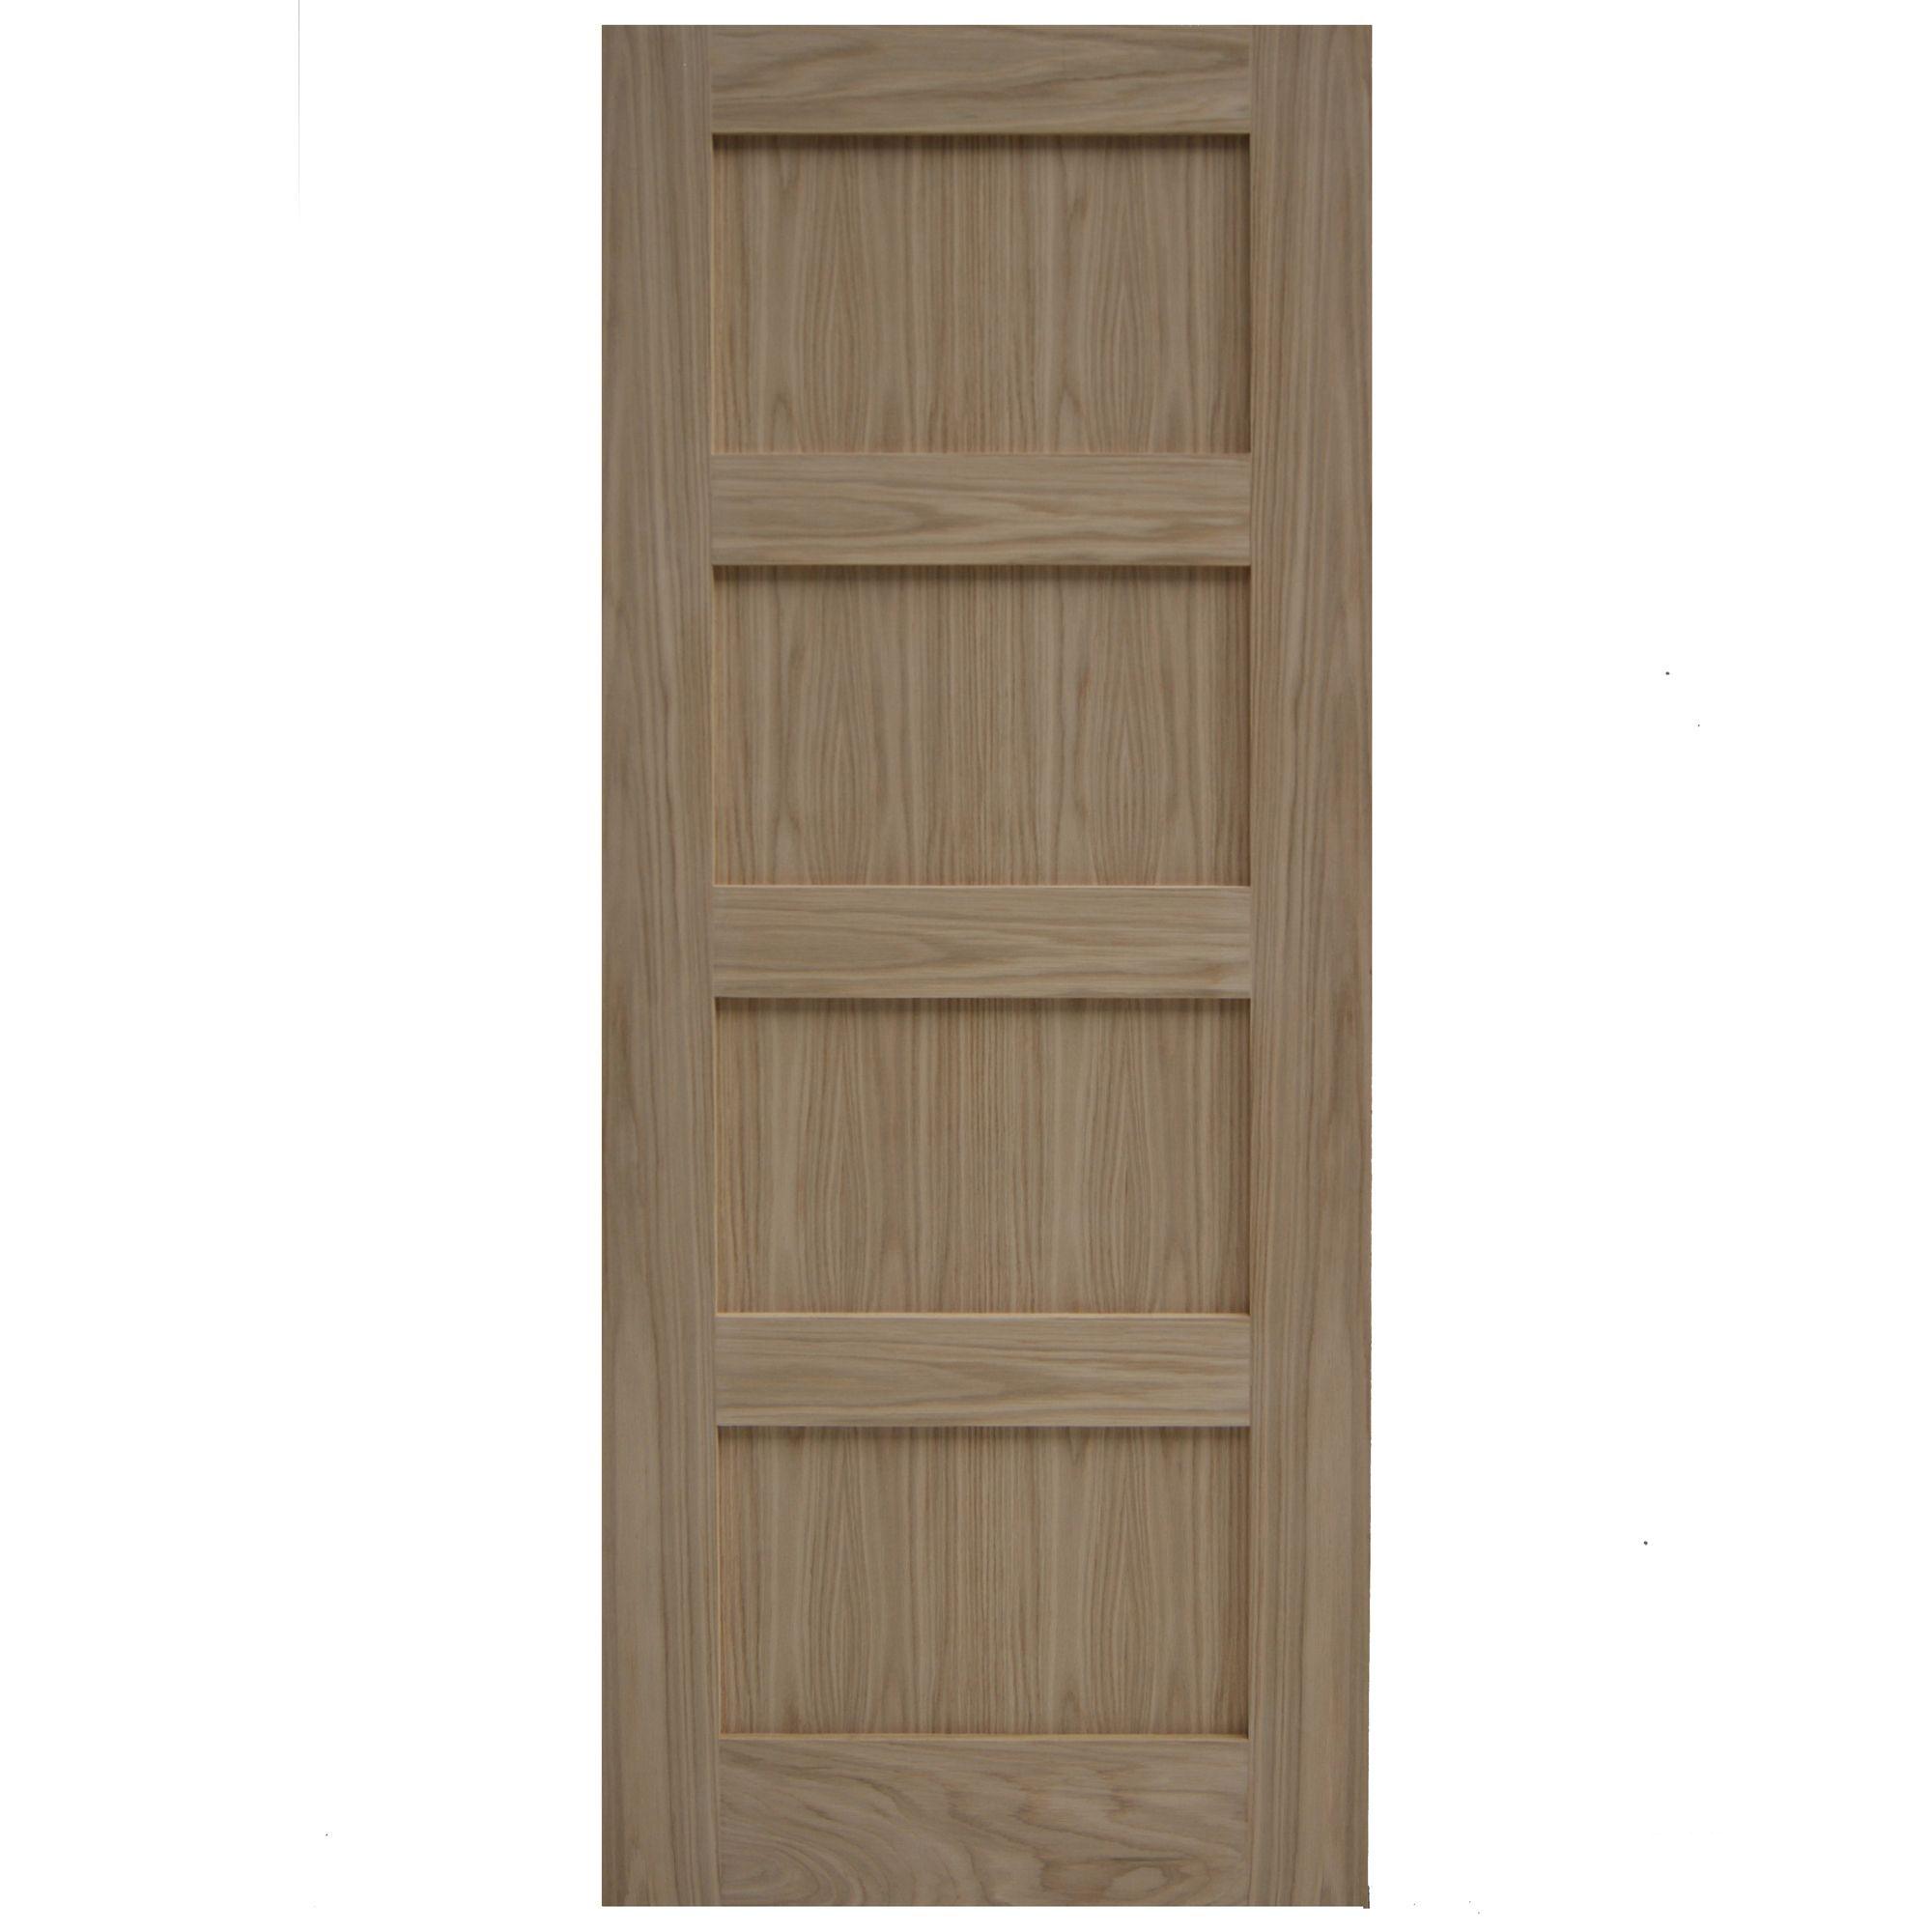 Shaker 4 Panel Oak Veneer Internal Unglazed Door H 1981mm W 762mm Departments Diy At B Amp Q